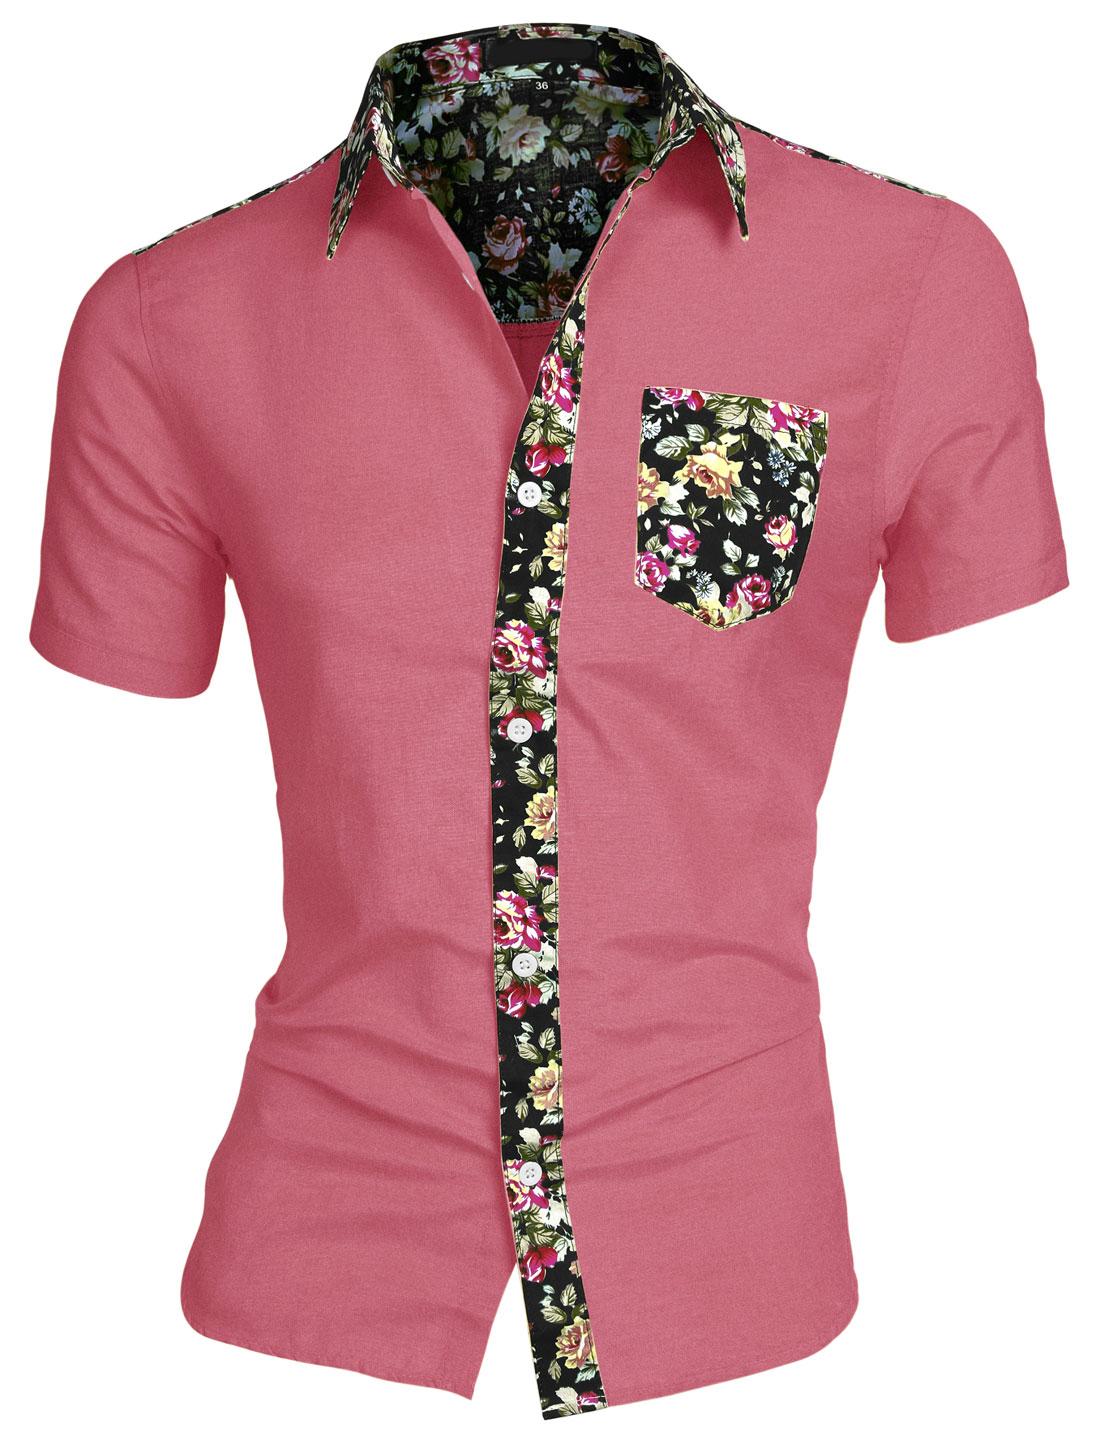 Men Point Collar Floral Pattern Button Down Pocket Shirt Fuchsia M